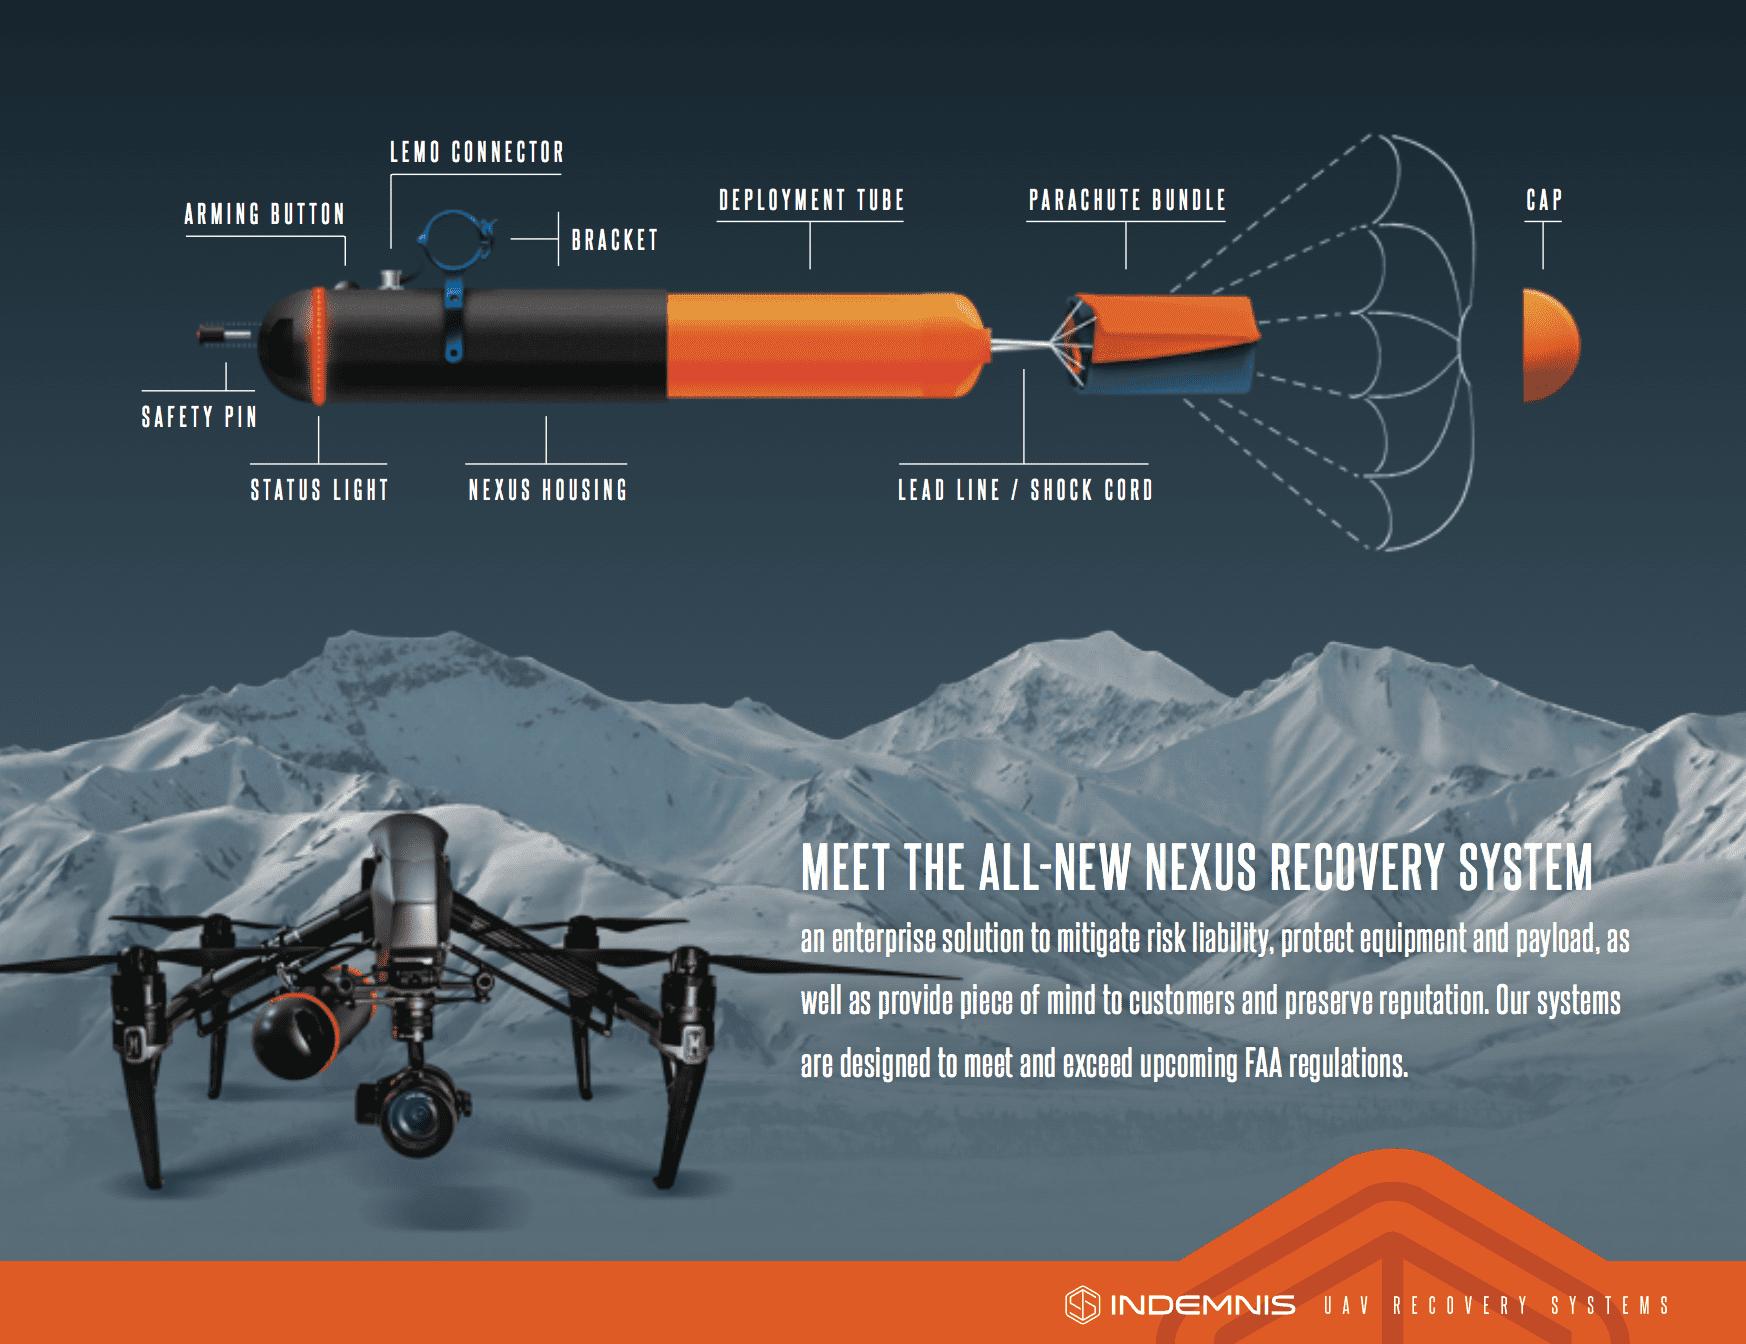 Paracadute per droni Dji